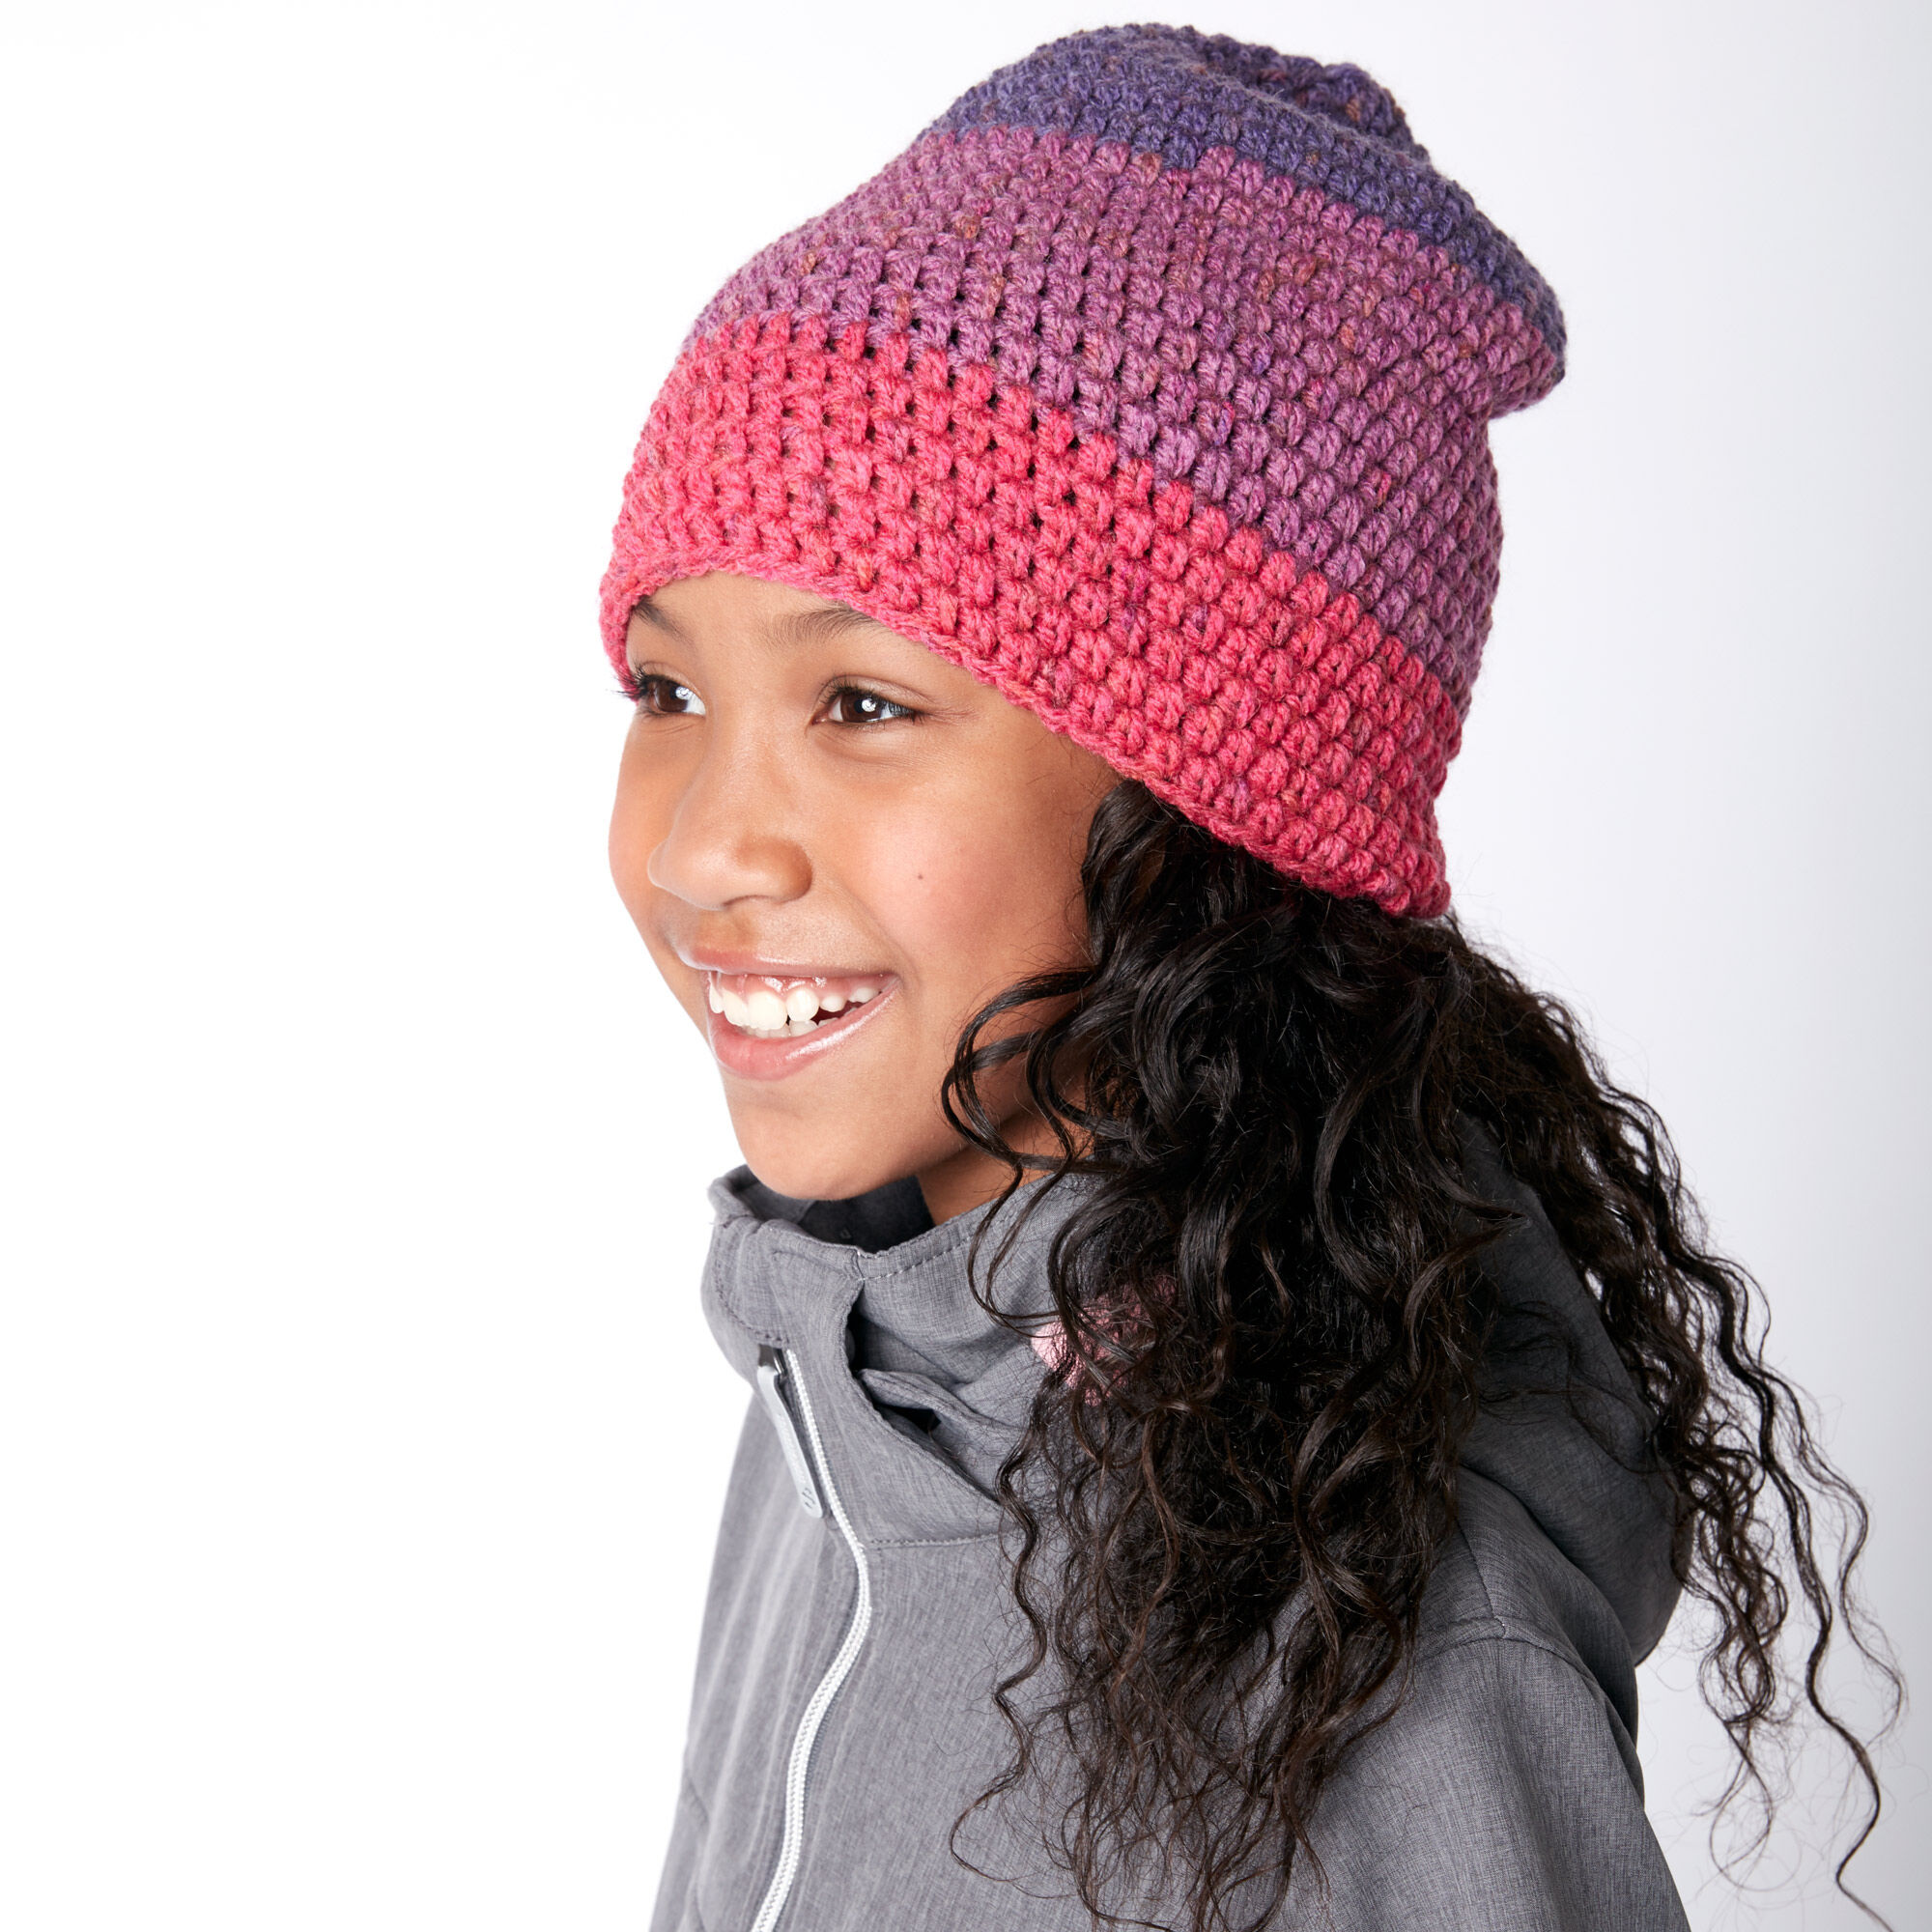 Caron Slouchy Crochet Beanie Pattern | Yarnspirations | Yarnspirations